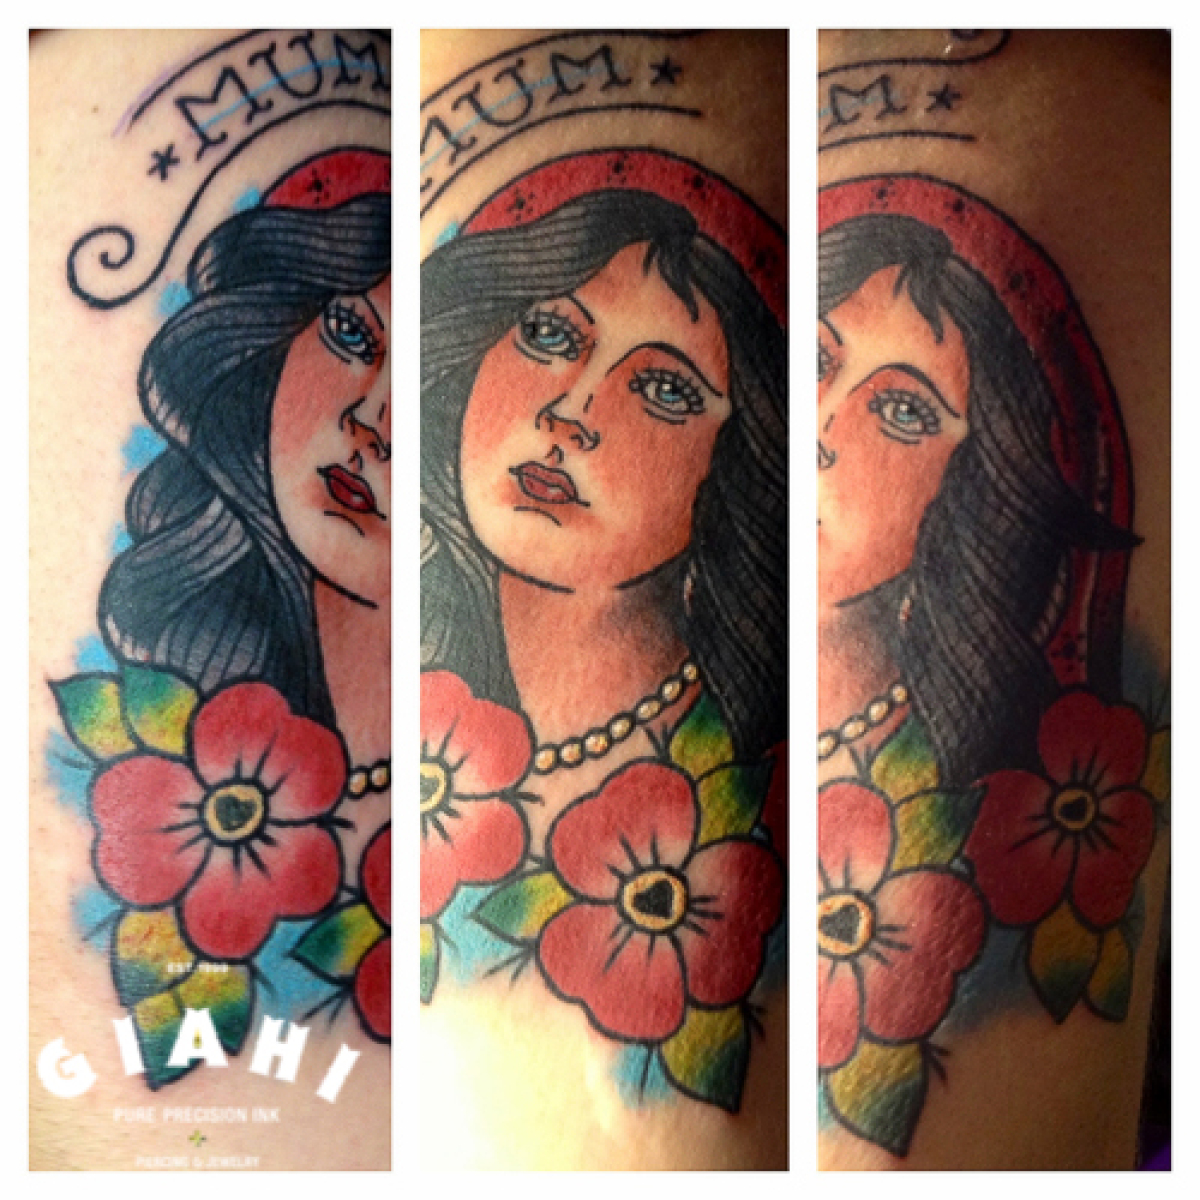 Mum Lettering Woman Old School tattoo by Elda Bernardes